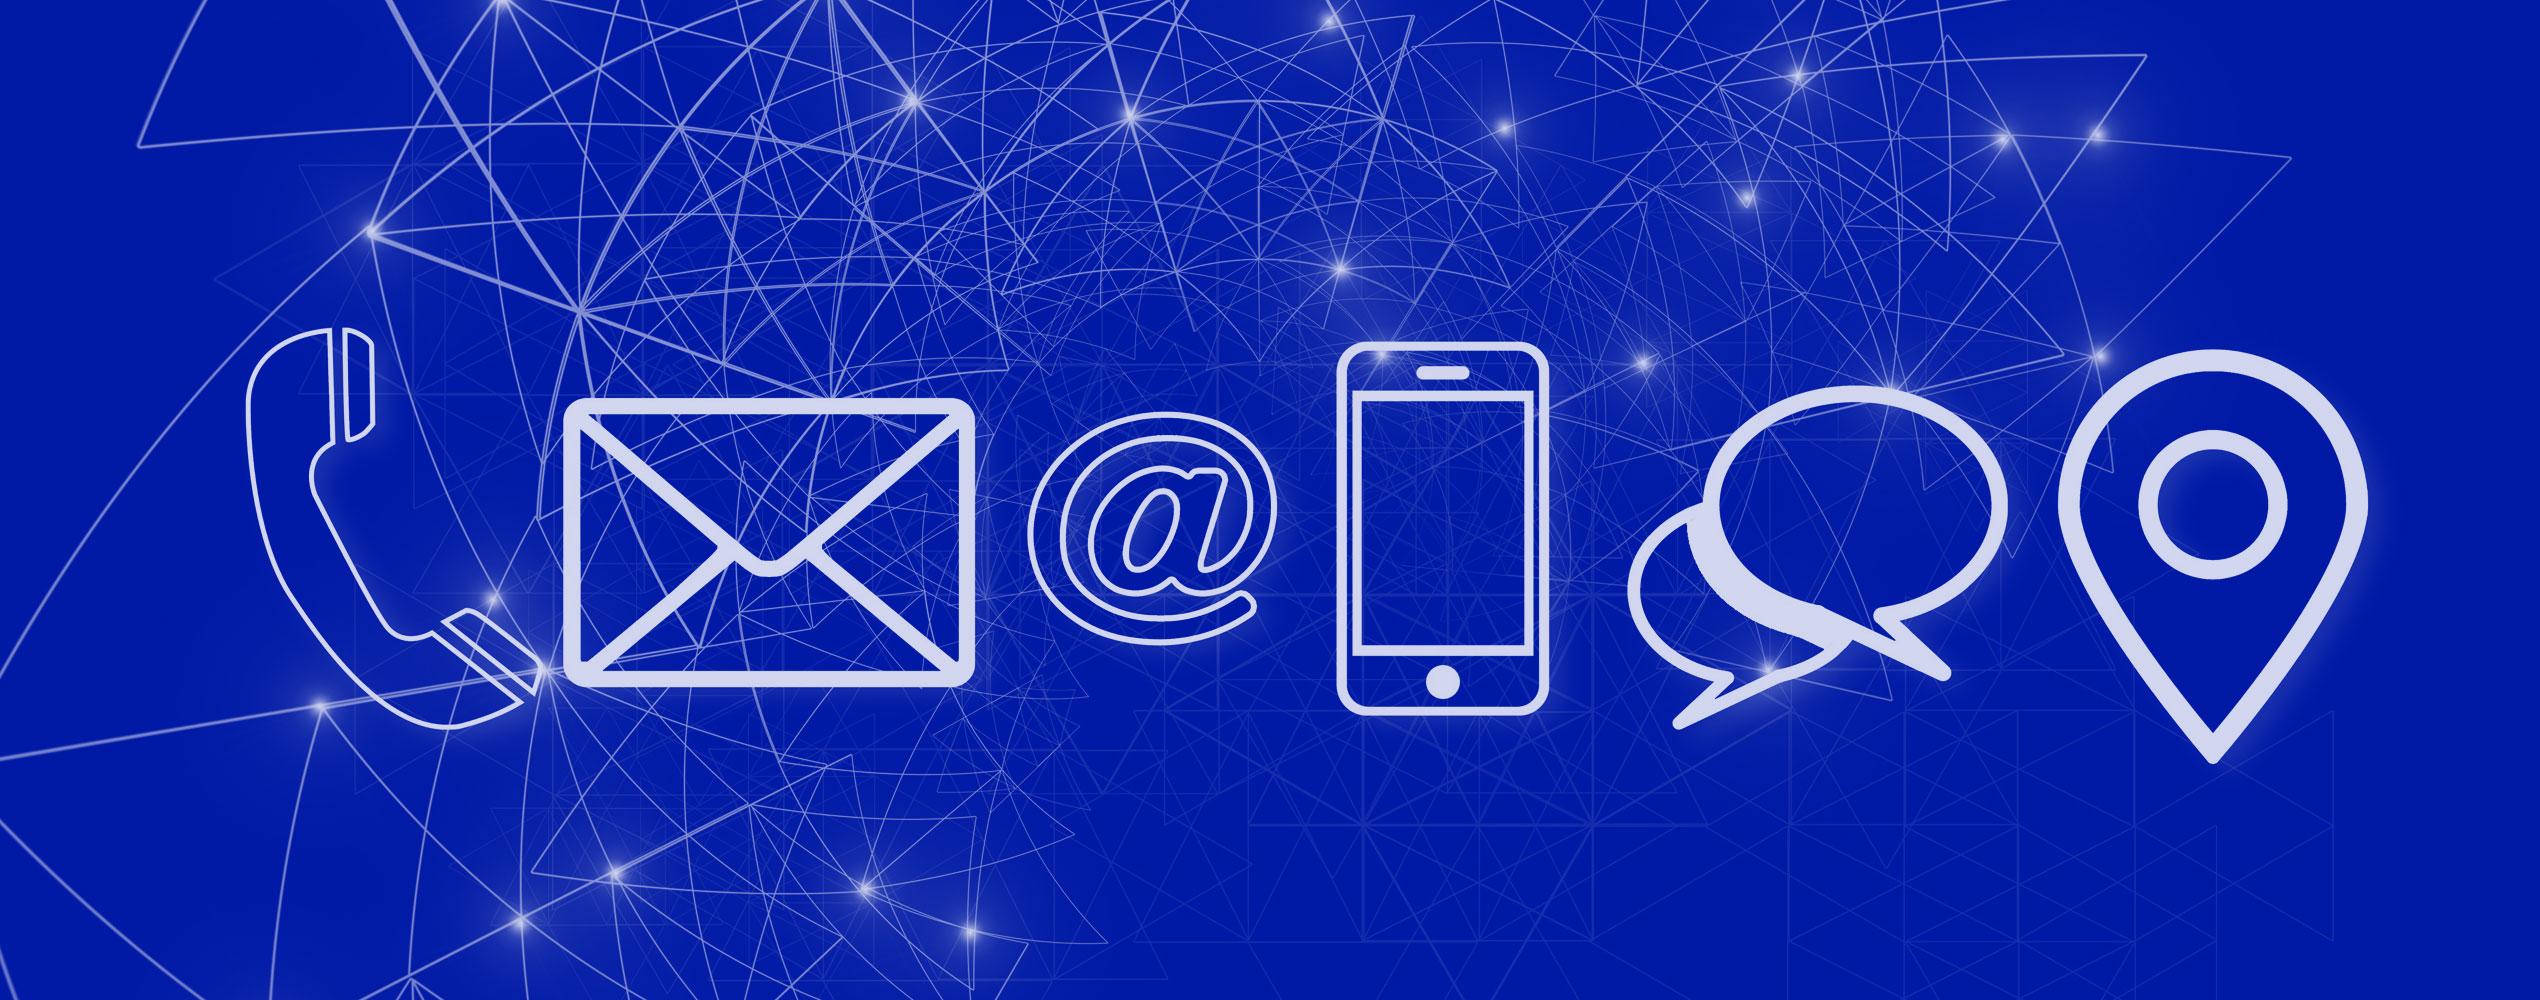 Smartphone Icons Vernetzung Fotolia